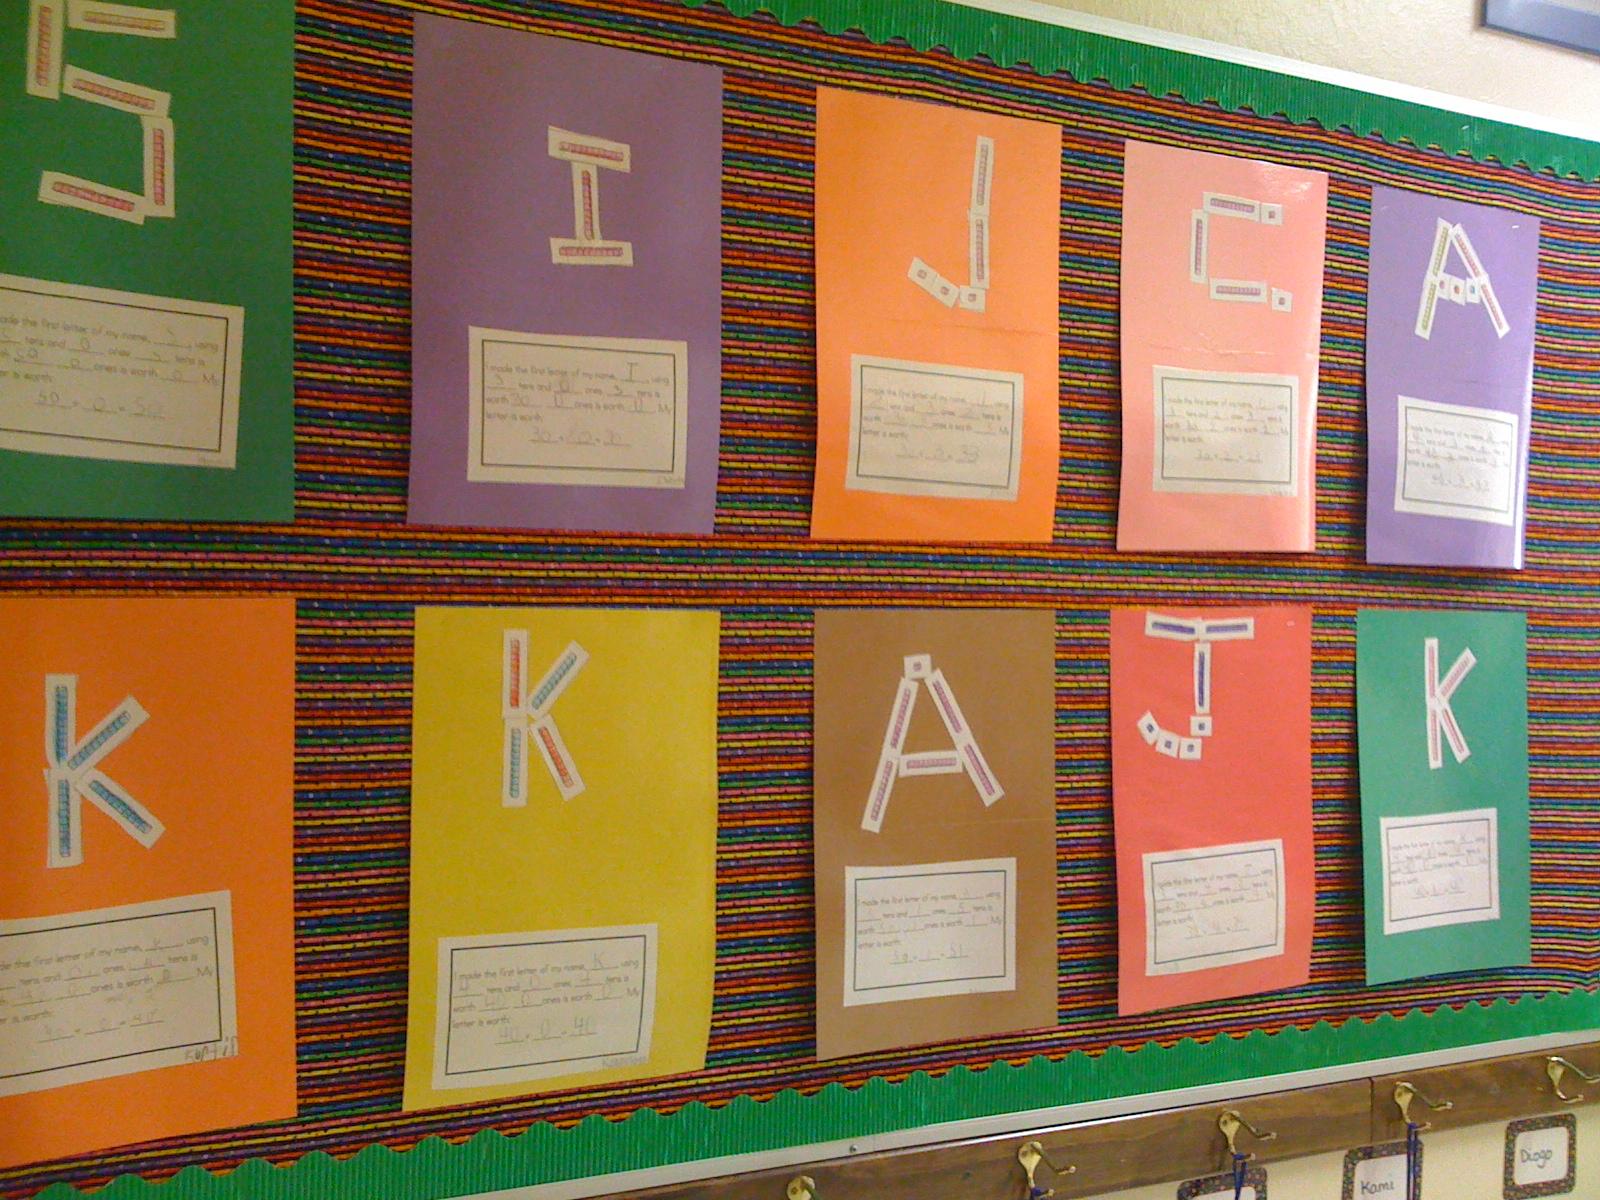 Bishop S Blackboard An Elementary Education Blog Place